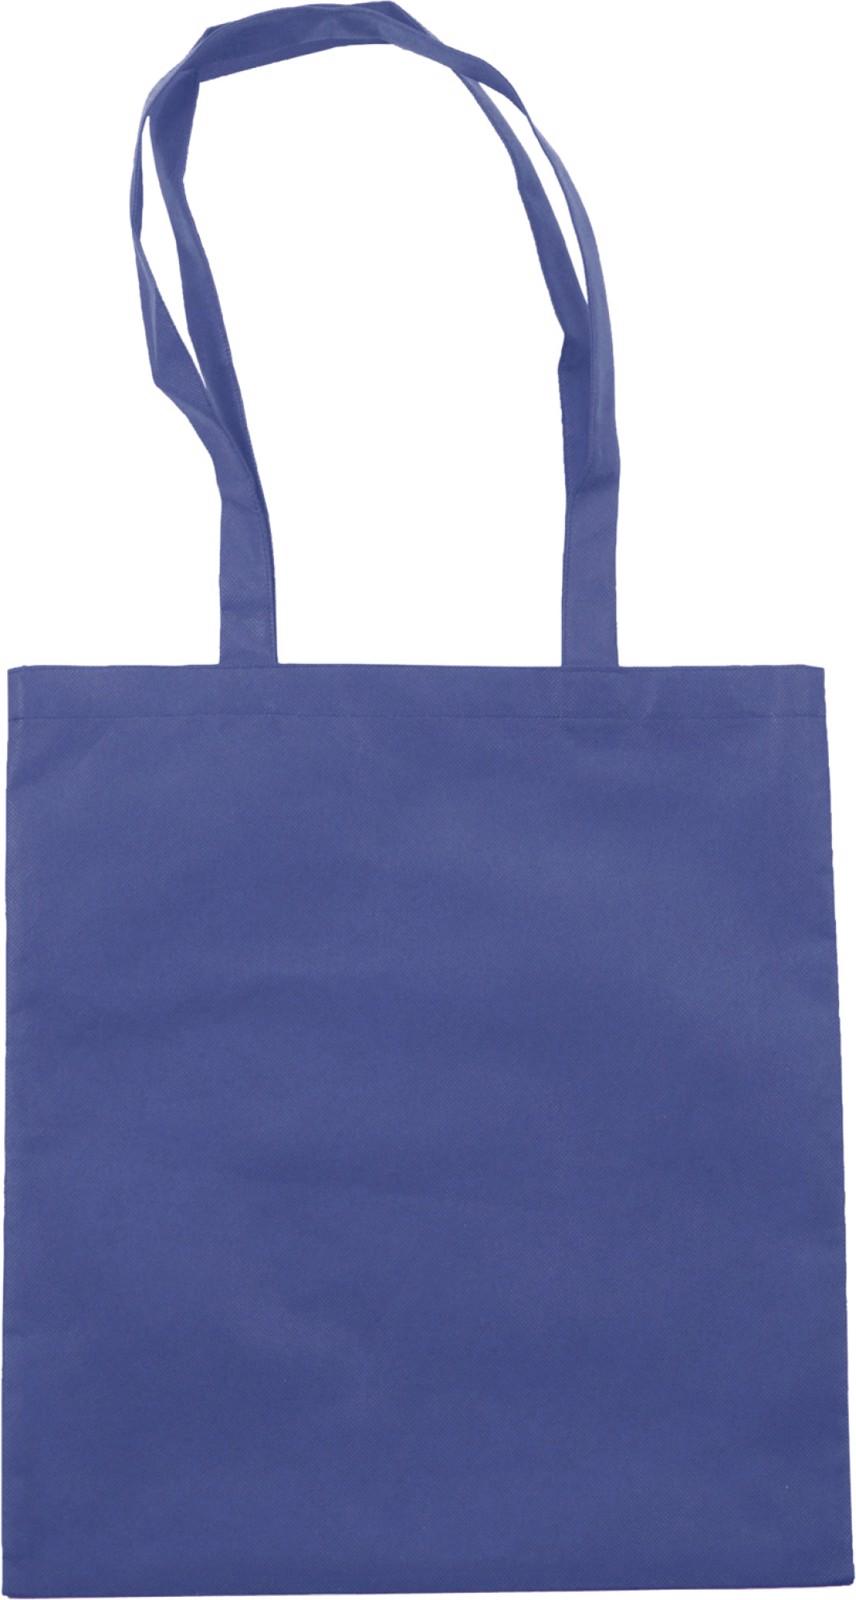 Nonwoven (80 gr/m²) shopping bag - Blue